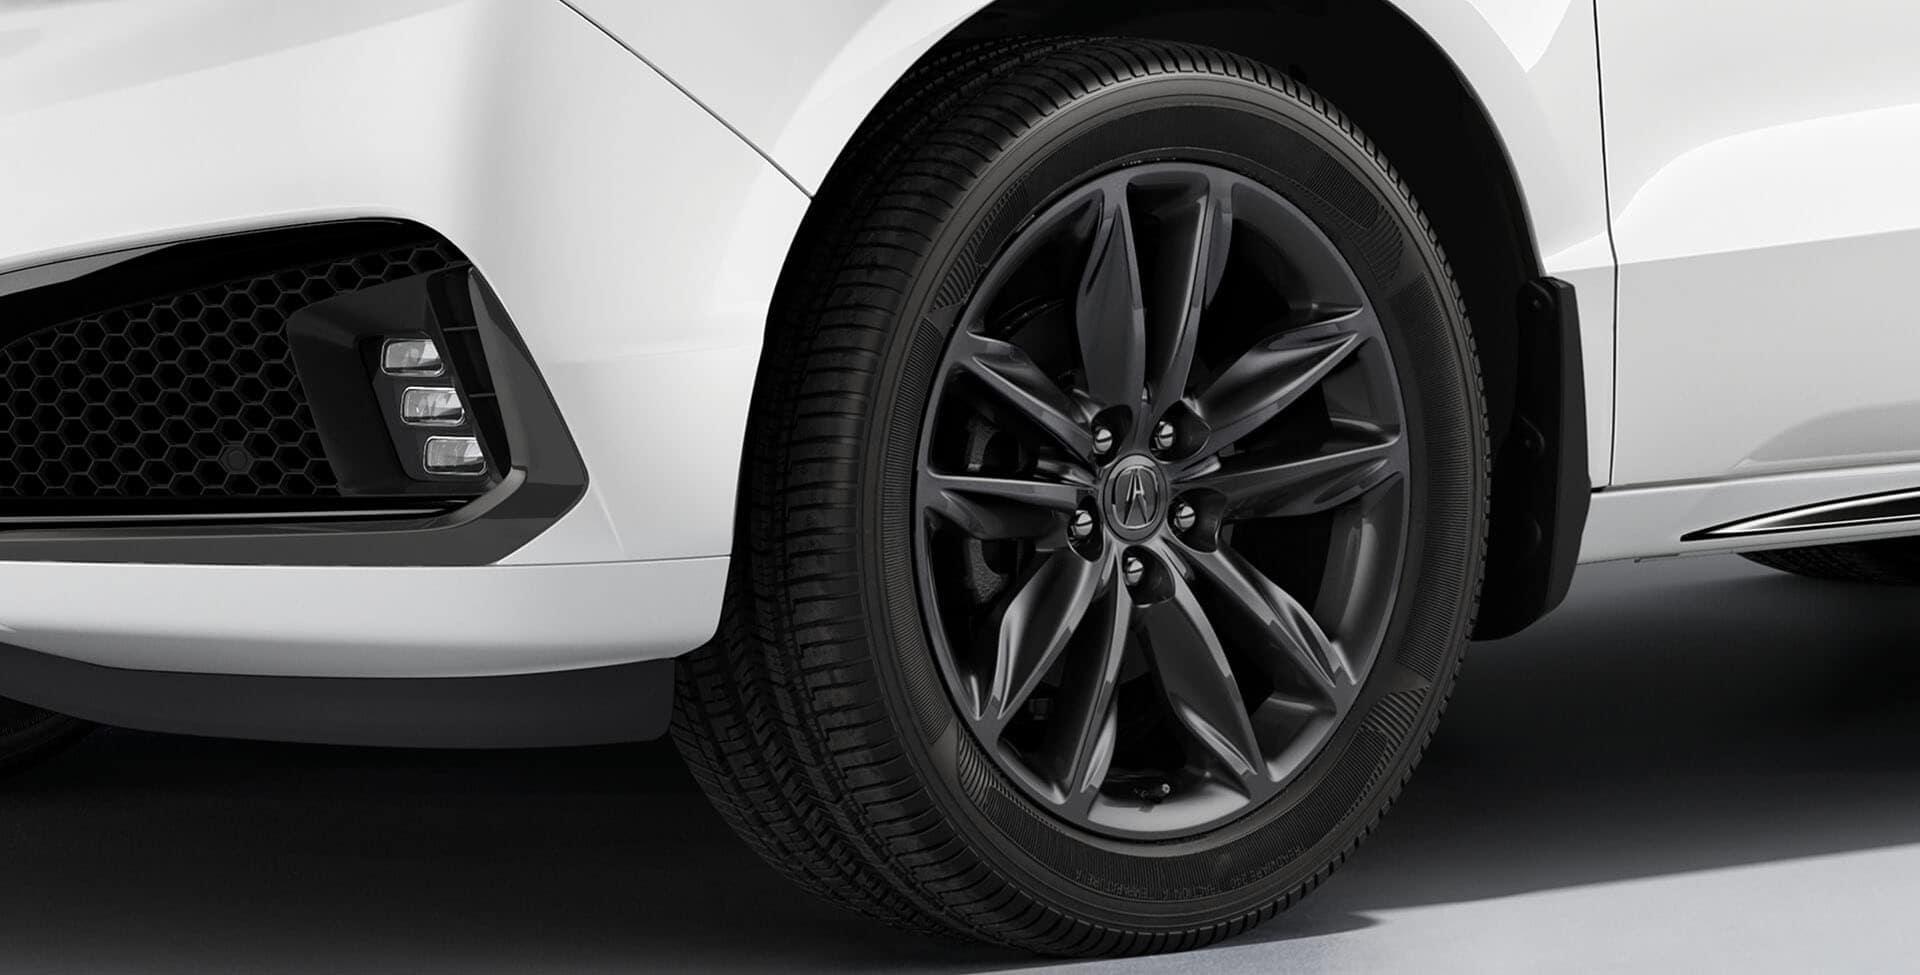 Acura MDX shark wheels